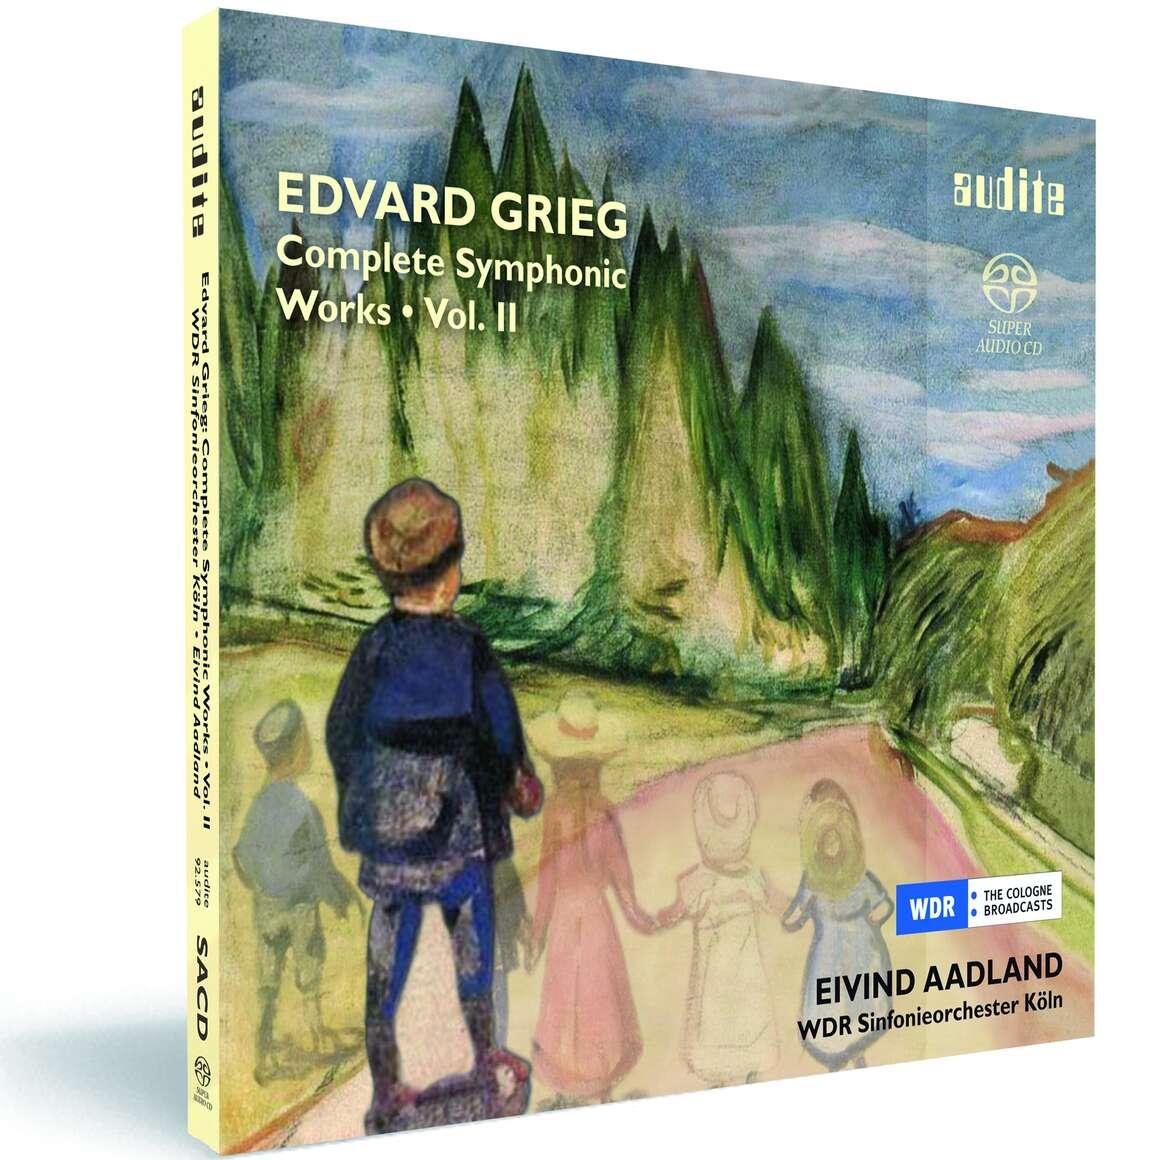 E. Grieg: Complete Symphonic Works Vol. II